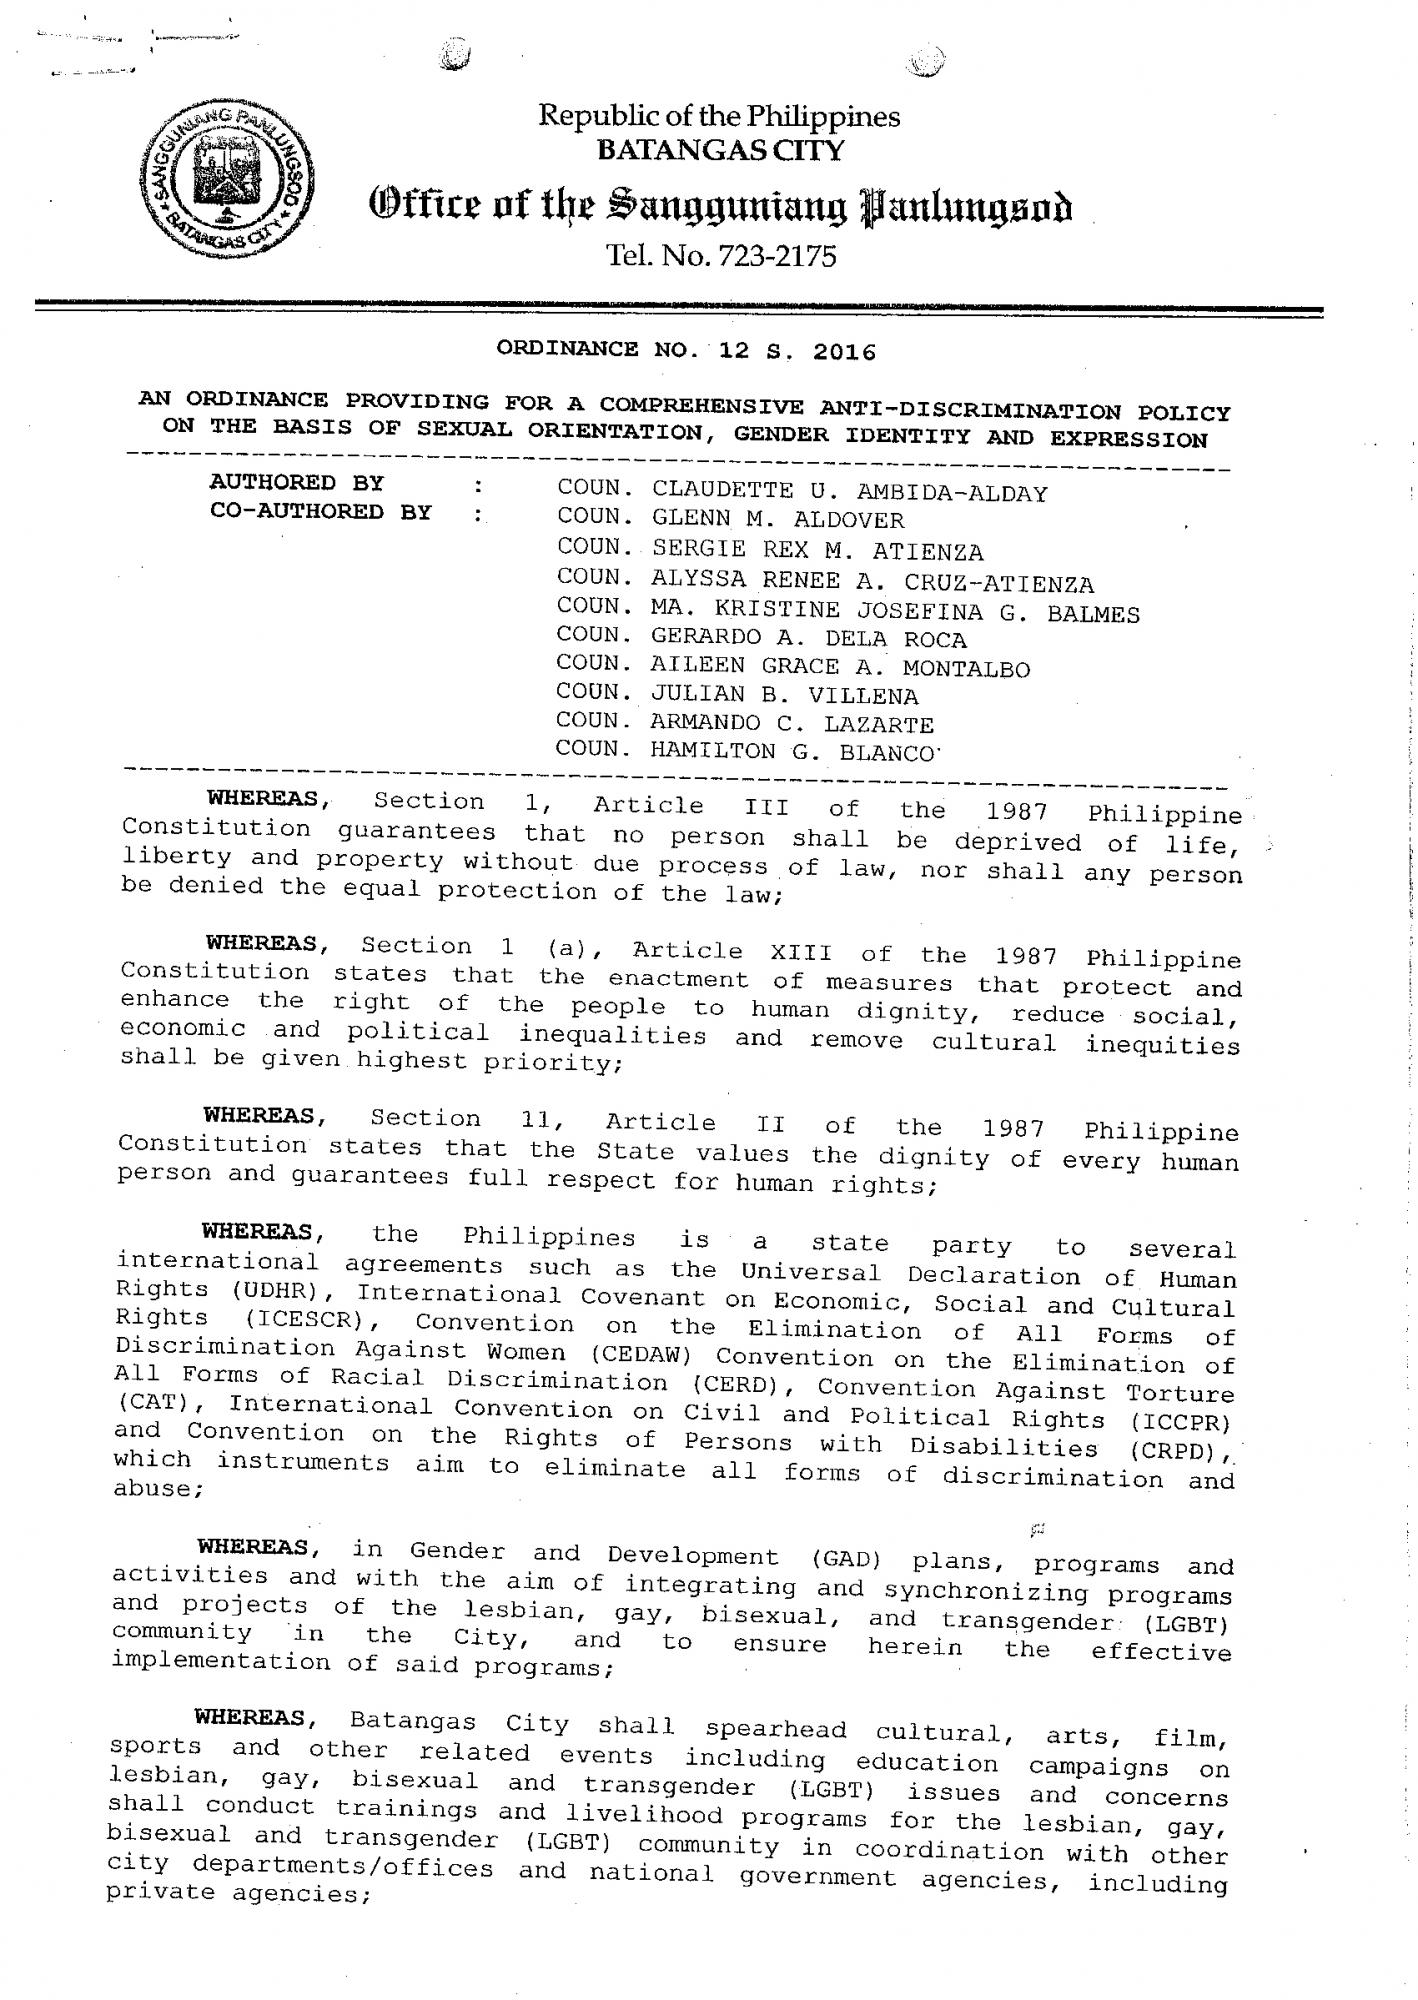 Batangas City Anti-Discrimination Ordinance